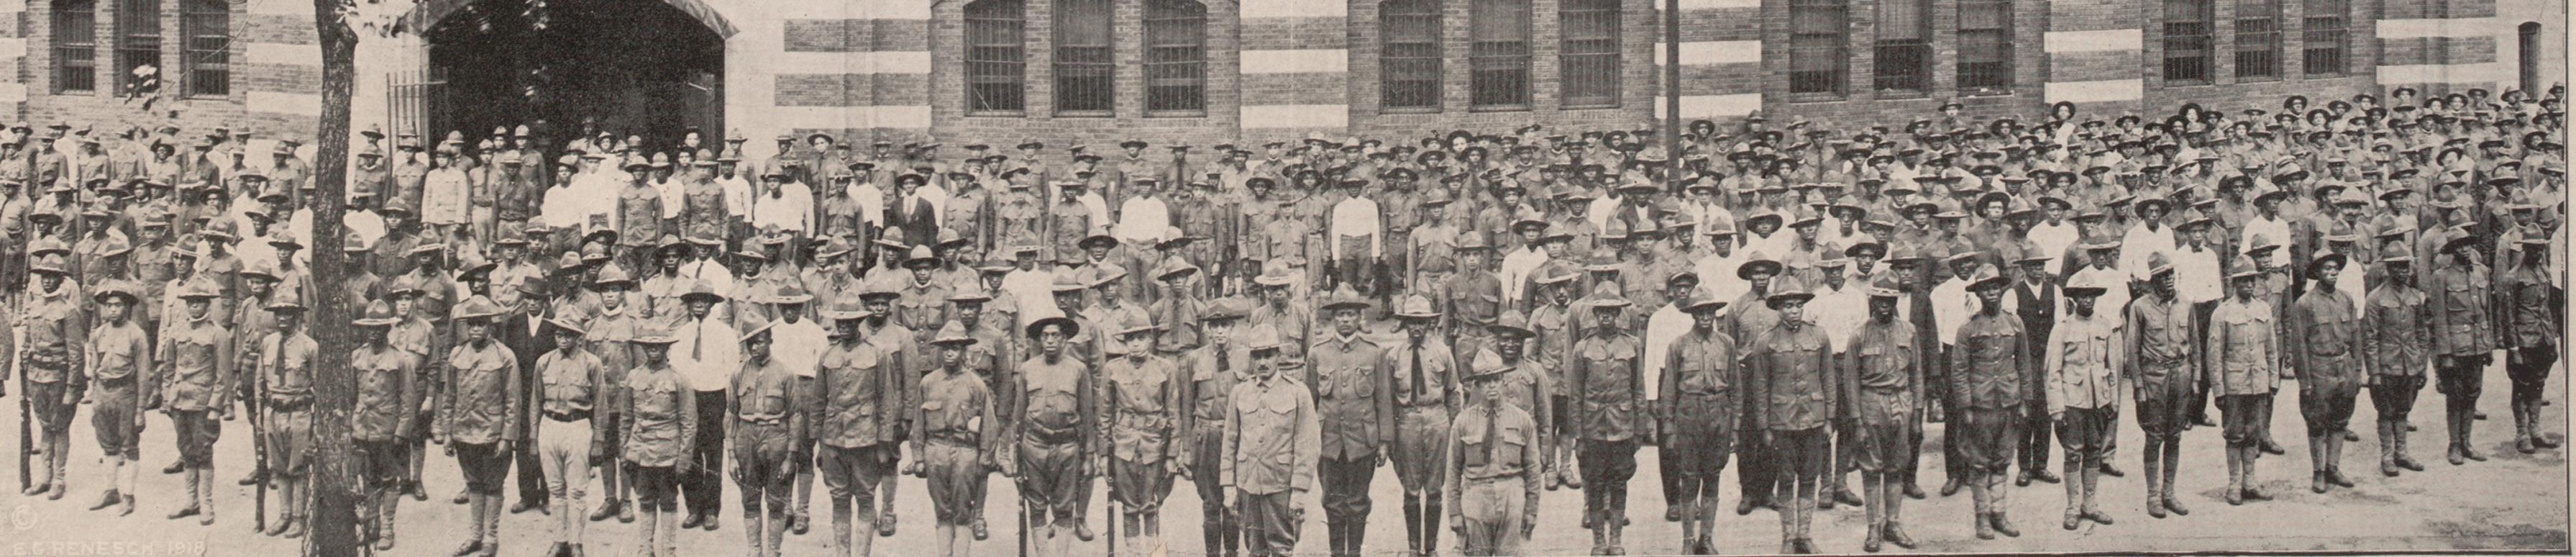 Eighth Illinois regiment in France, ca. 1918. (Gilder Lehrman Collection)